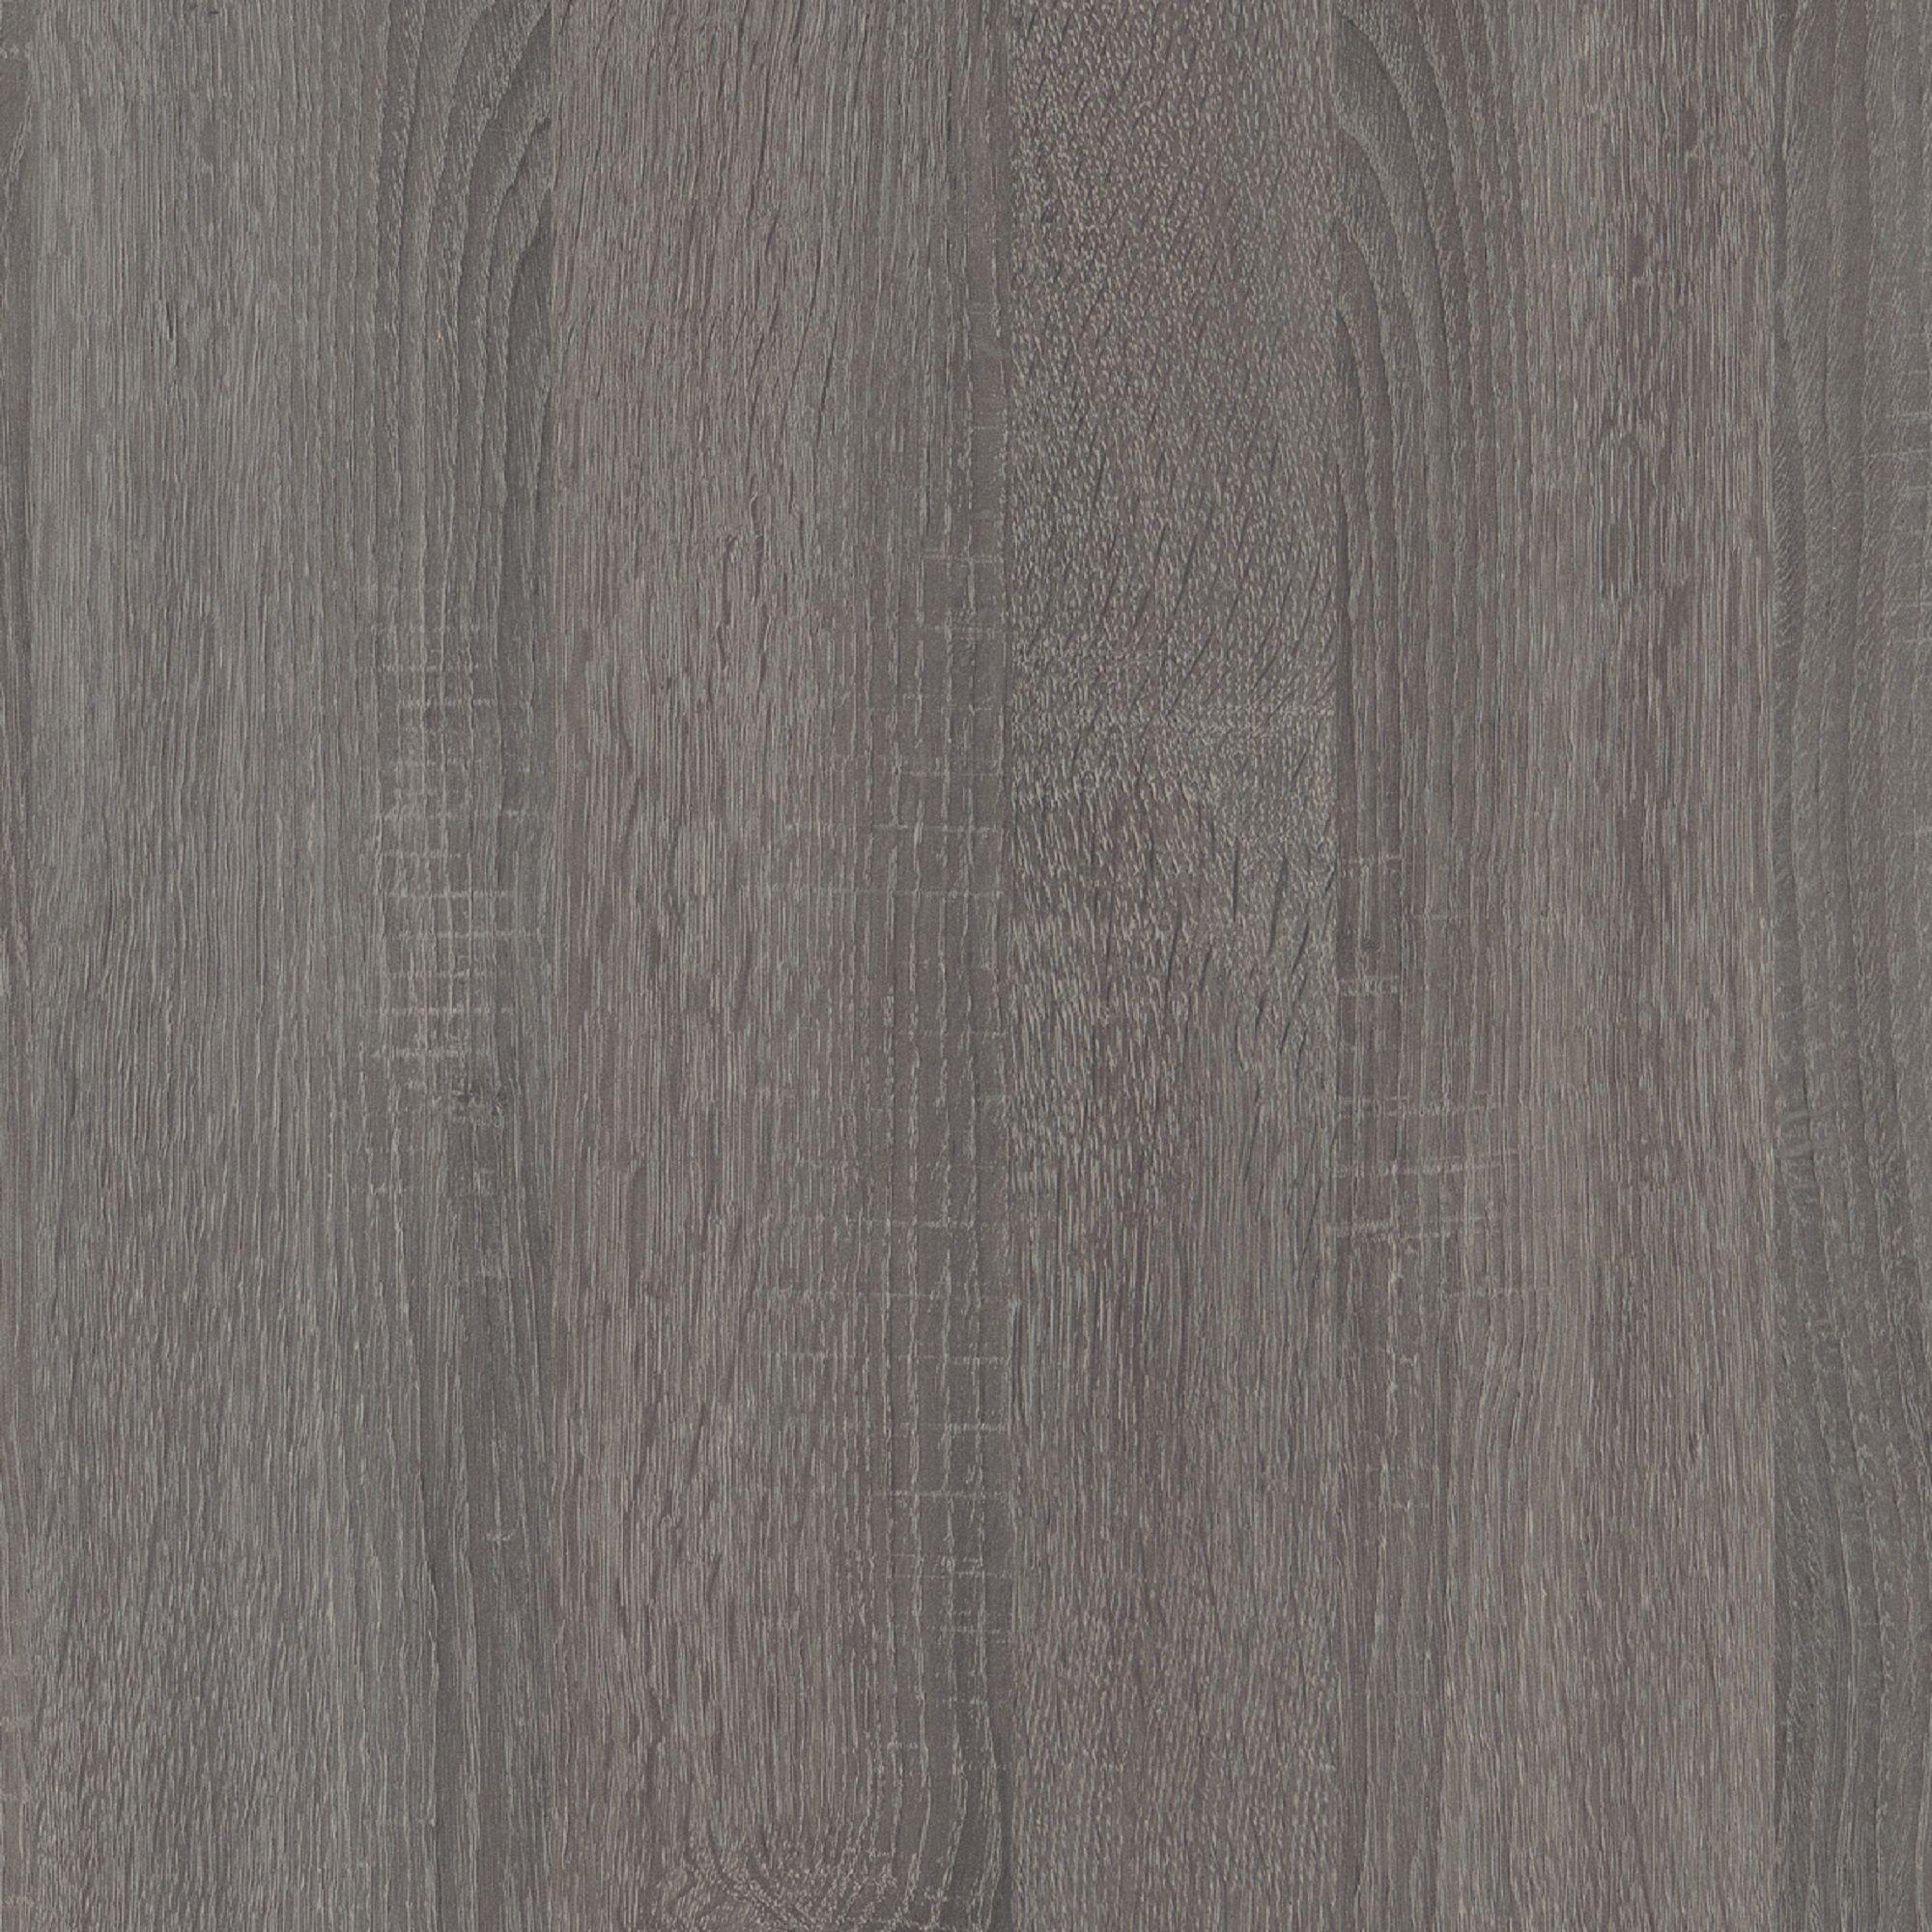 9mm Topia Dark Wood Effect Dark Wood Effect Kitchen Splashback Square Edge Departments Diy